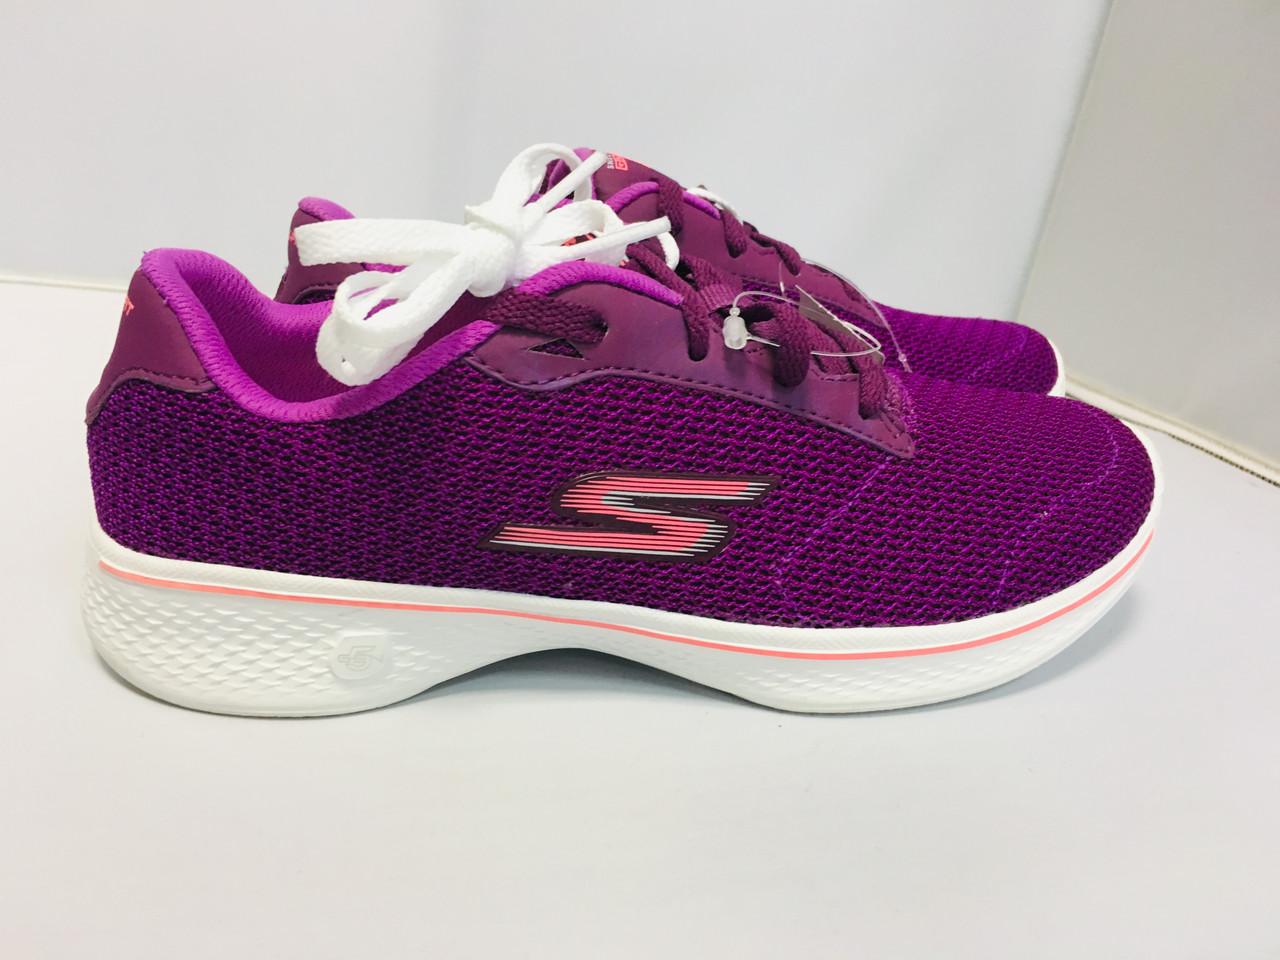 Женские кроссовки Skechers Gowalk 4, 35,5 размер